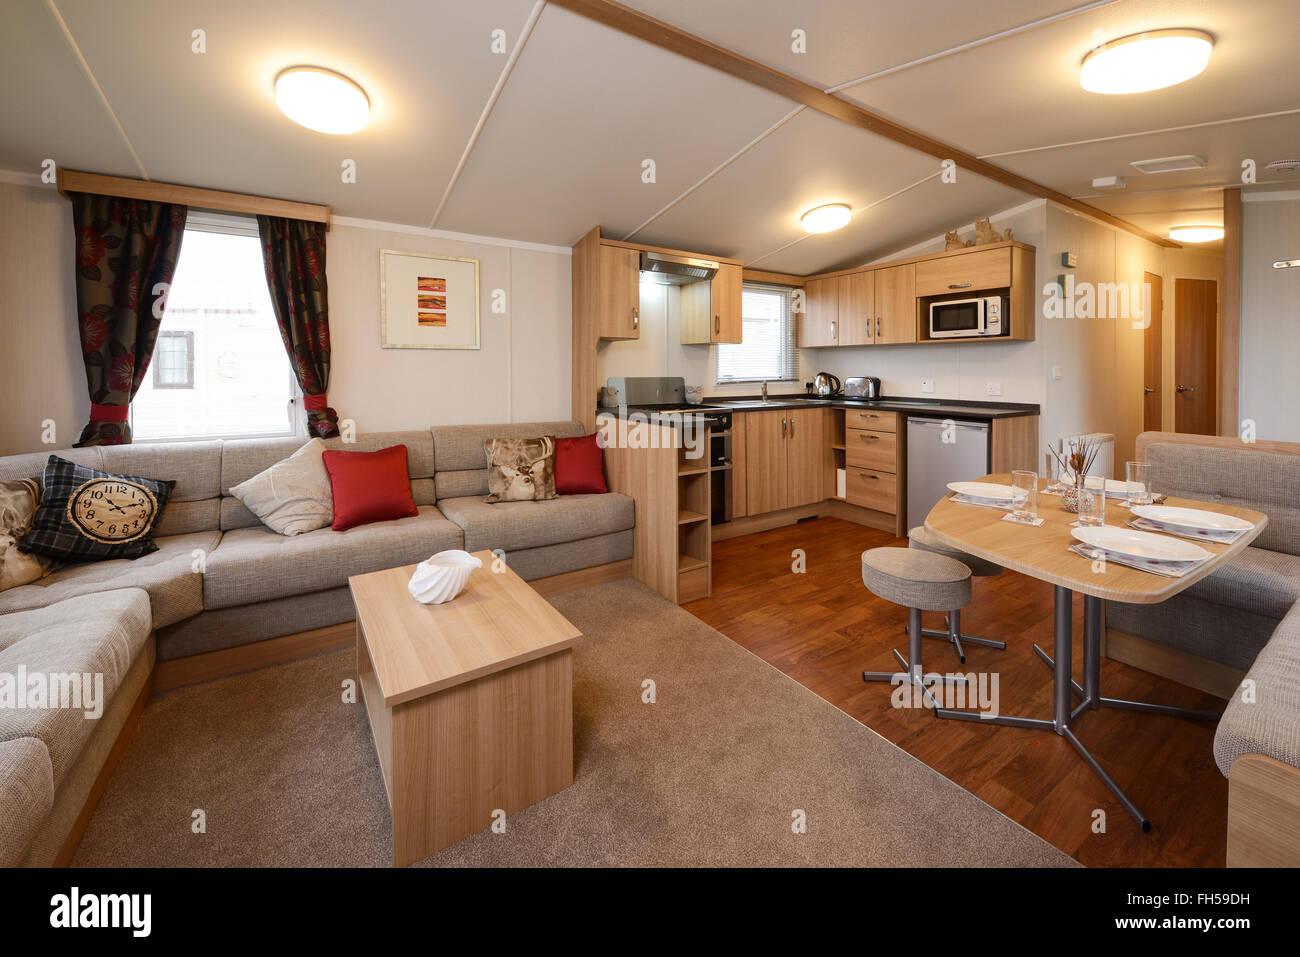 Interior of a static caravan showing living room kitchen for Interior caravan designs